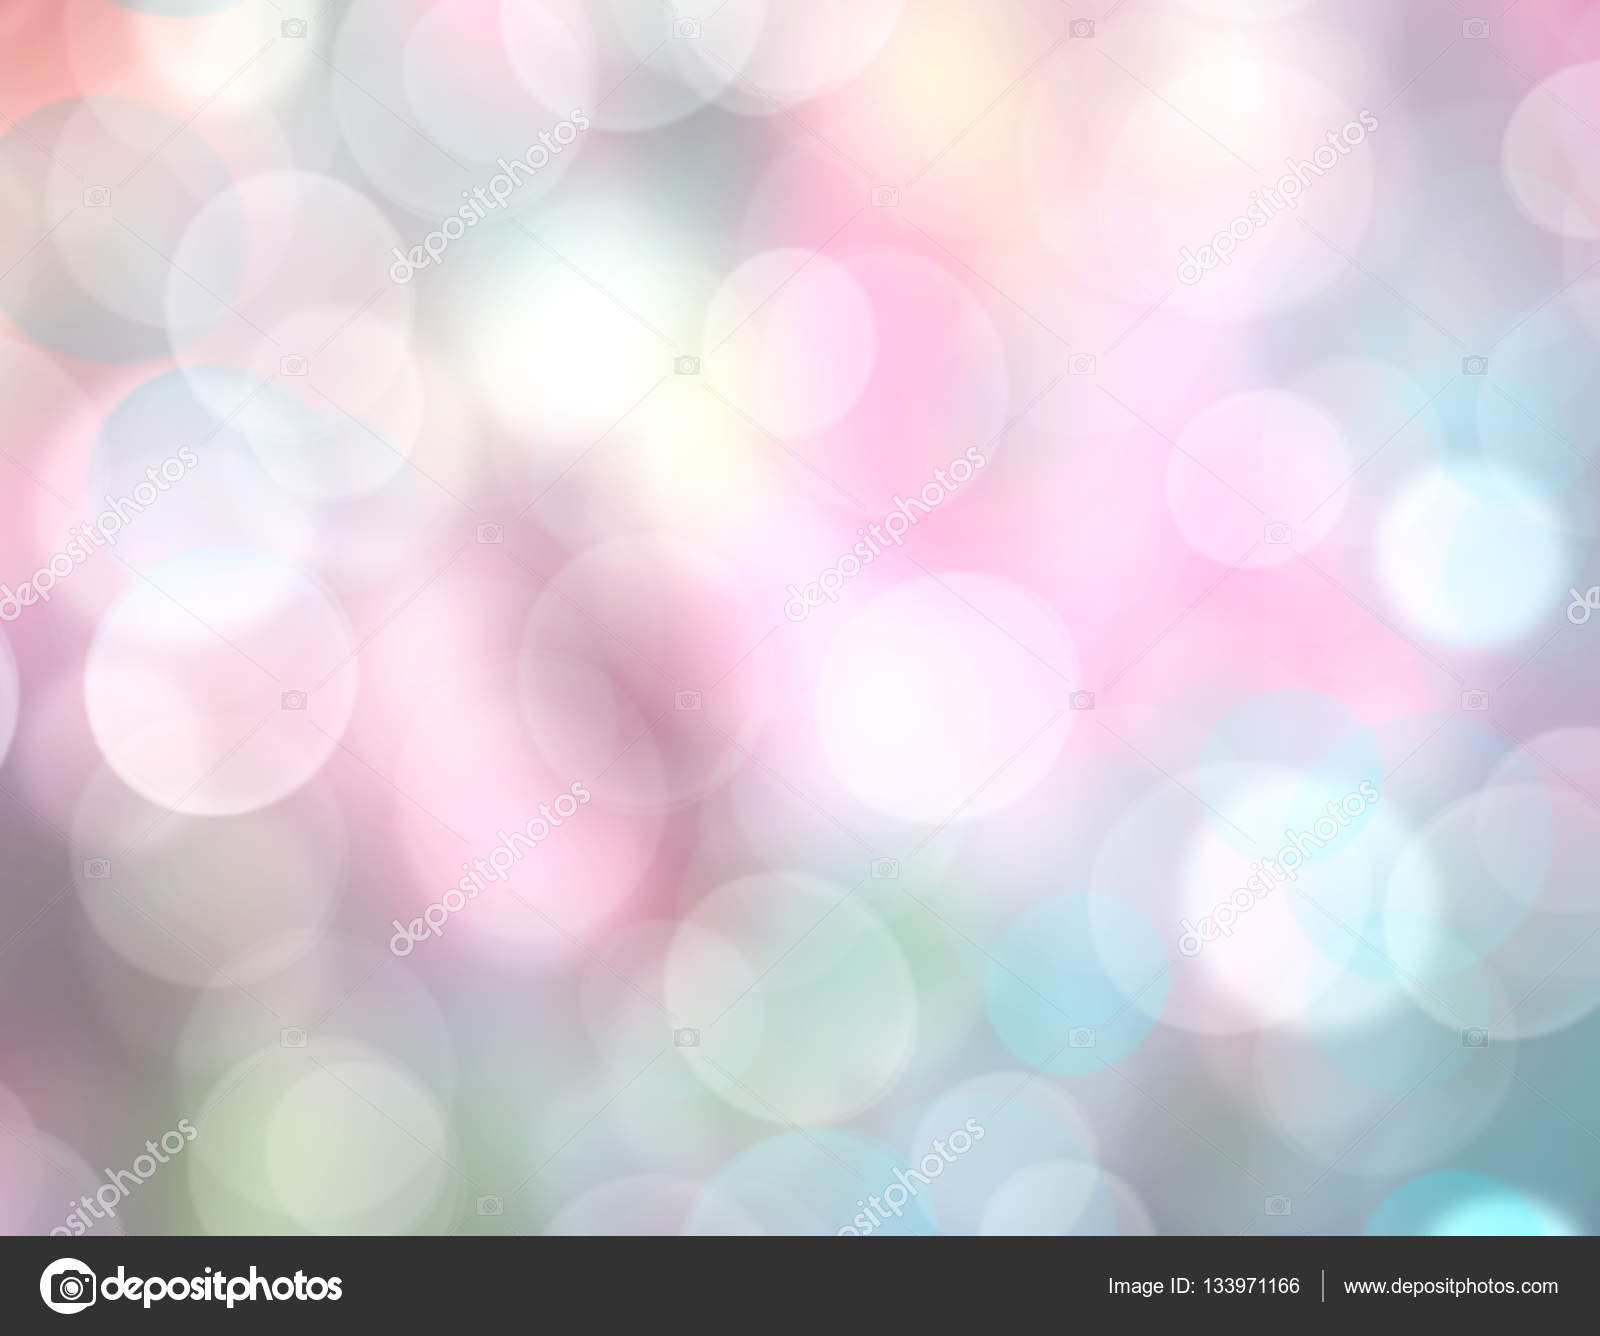 depositphotos 133971166 stock photo soft rainbow pink blue color